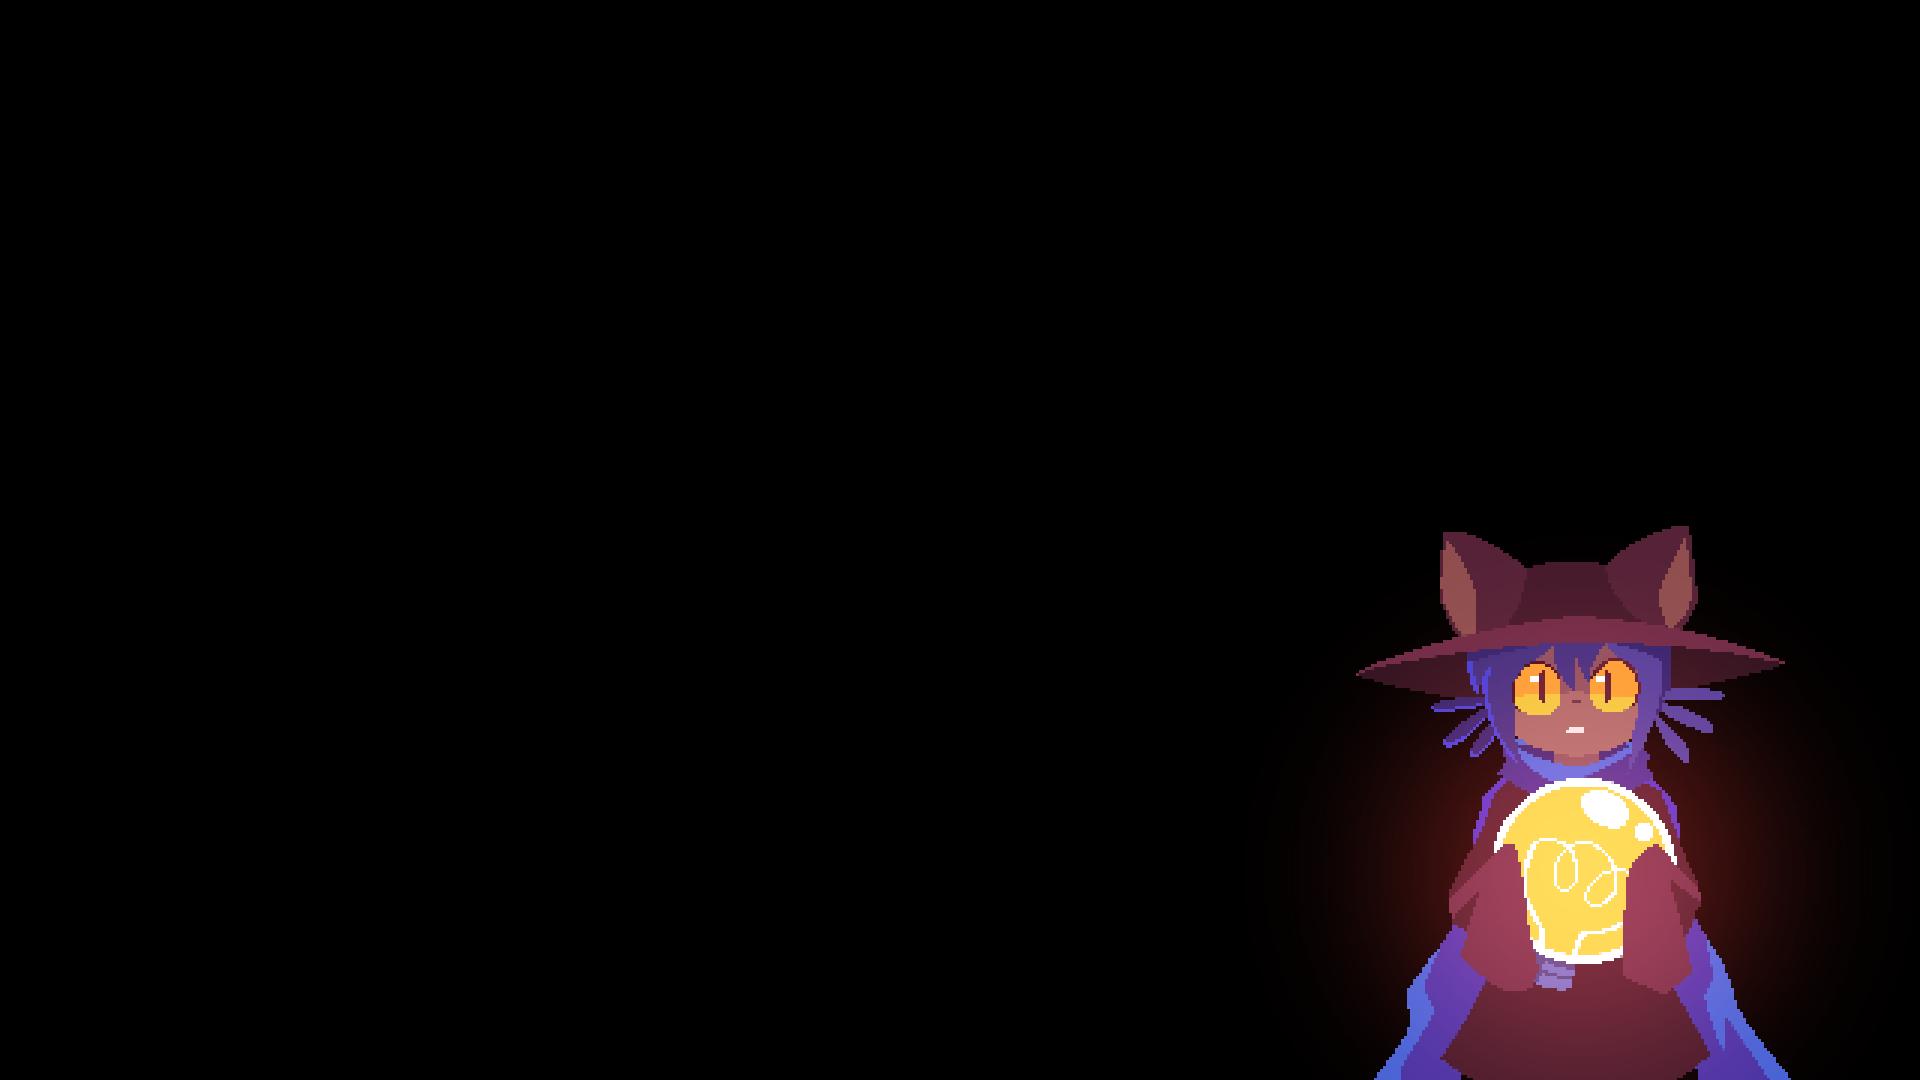 Anime 1920x1080 OneShot Niko RPG Maker video game art video game characters neko ears cat boy hat scarf lightbulb minimalism pixel art dark background edit